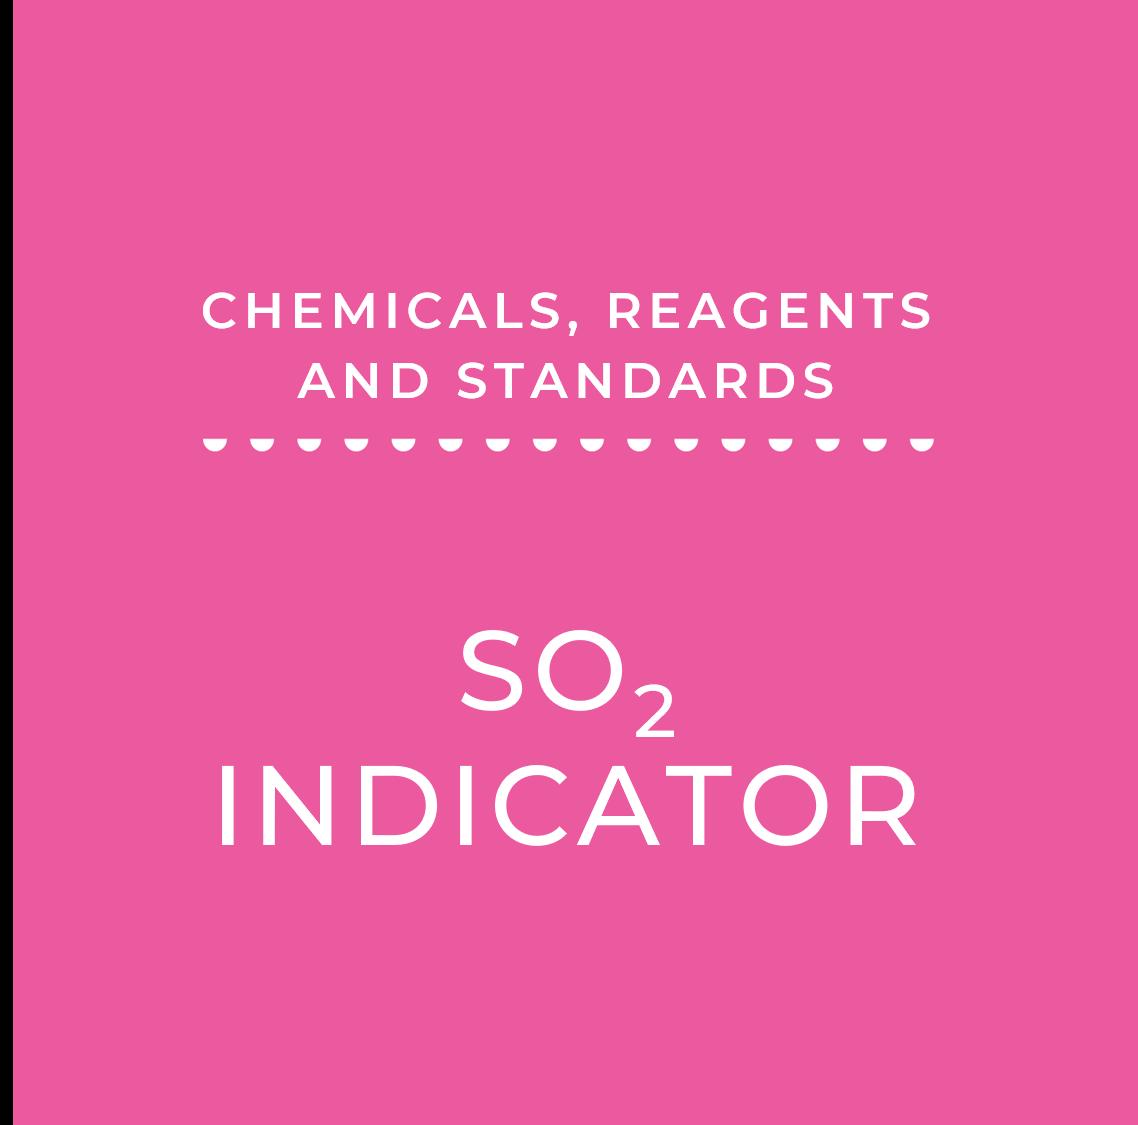 SO2 Indicator